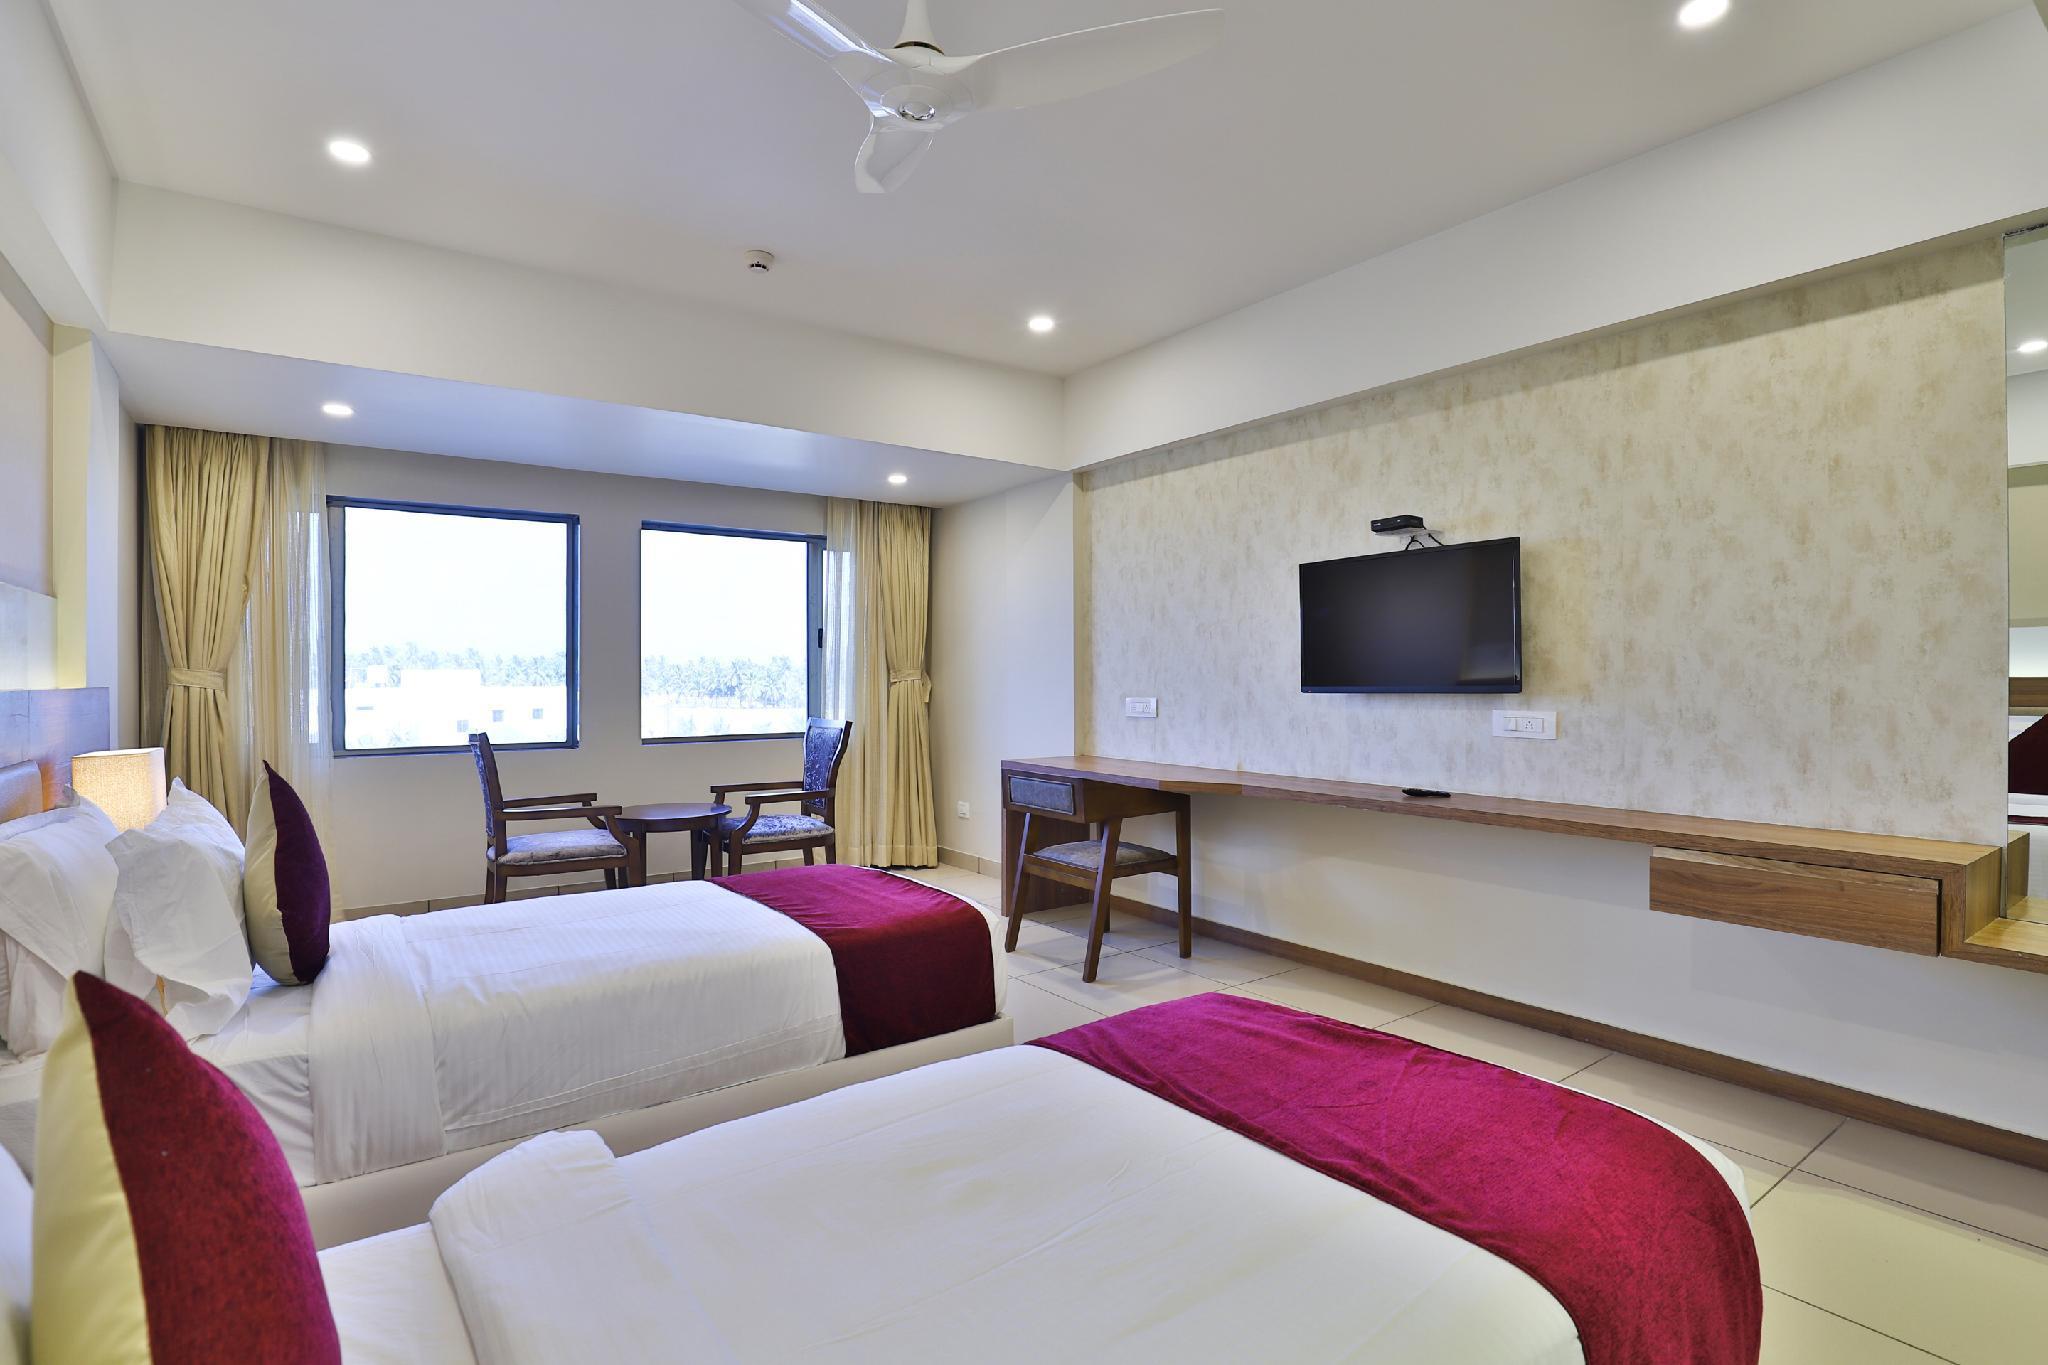 OYO 30464 Hotel Prabhas, Gir Somnath